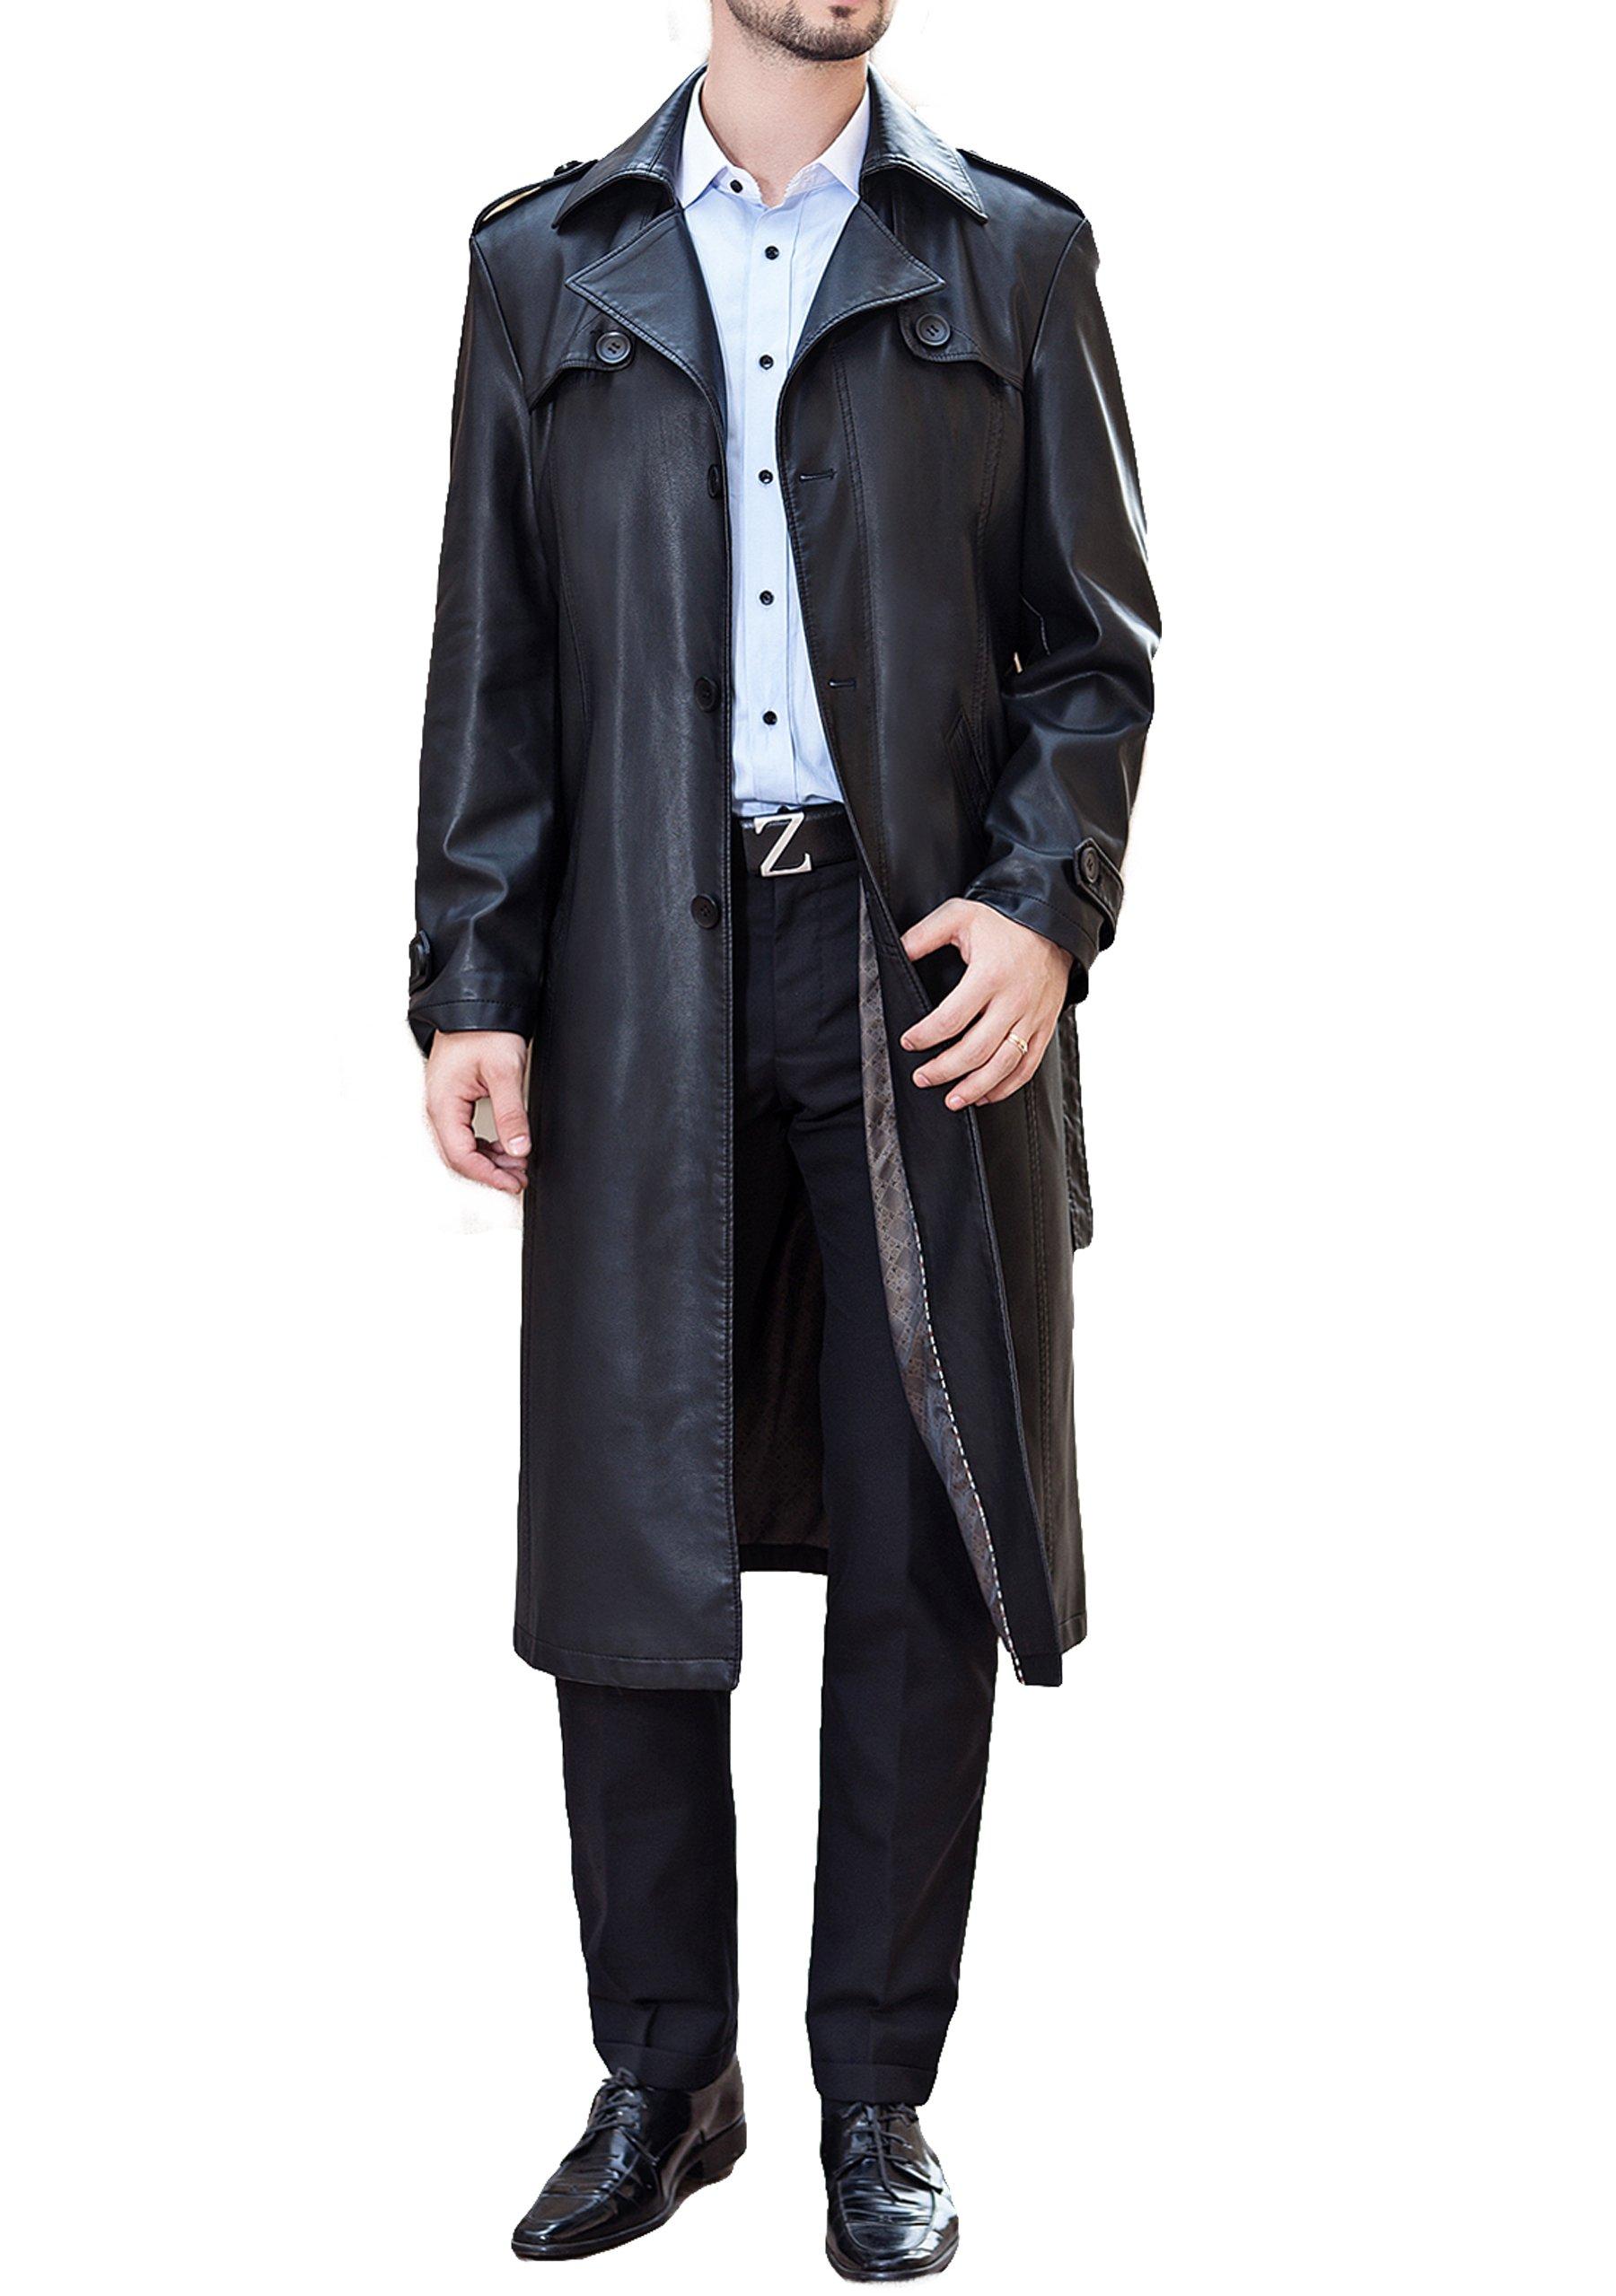 Men business suit collar Long Trench Coat fashion Long leather jacket (M)